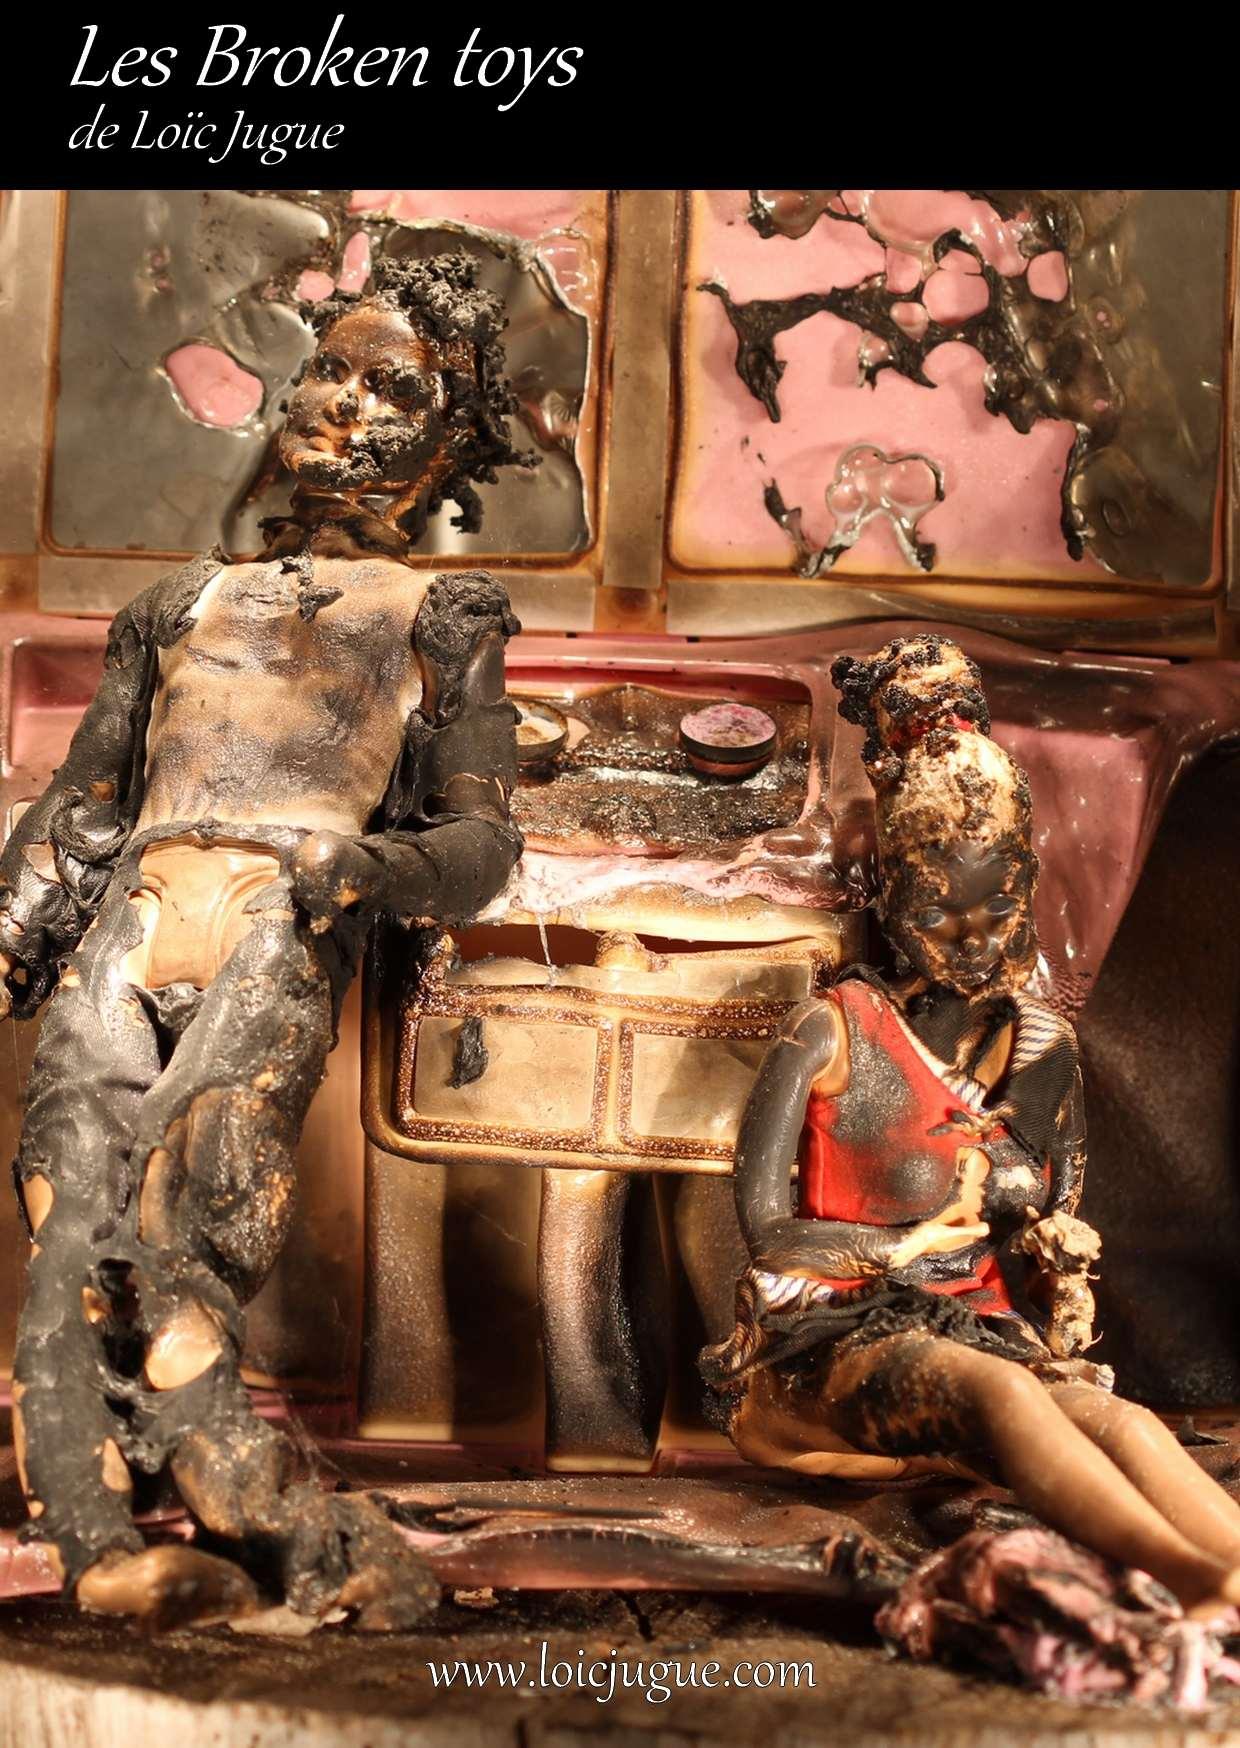 Les broken toys de Loïc Jugue: Barbie et Ken